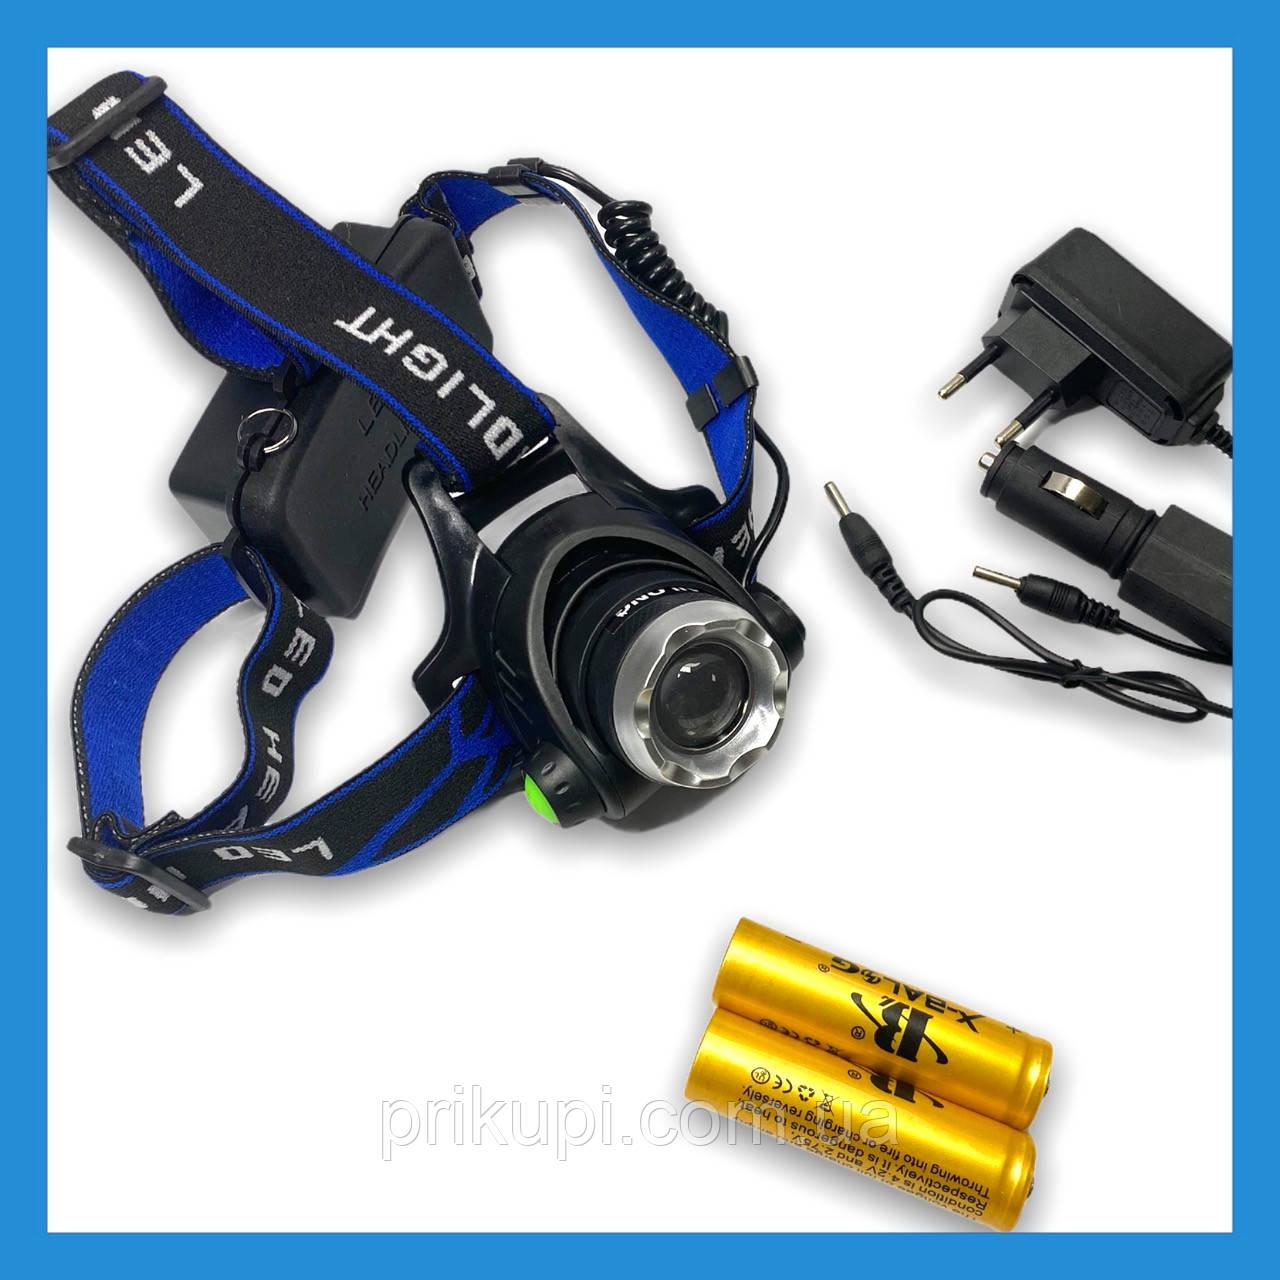 Налобний ліхтар Police 204C (BL-6699) - 28000W , Т6, zoom, аккум.